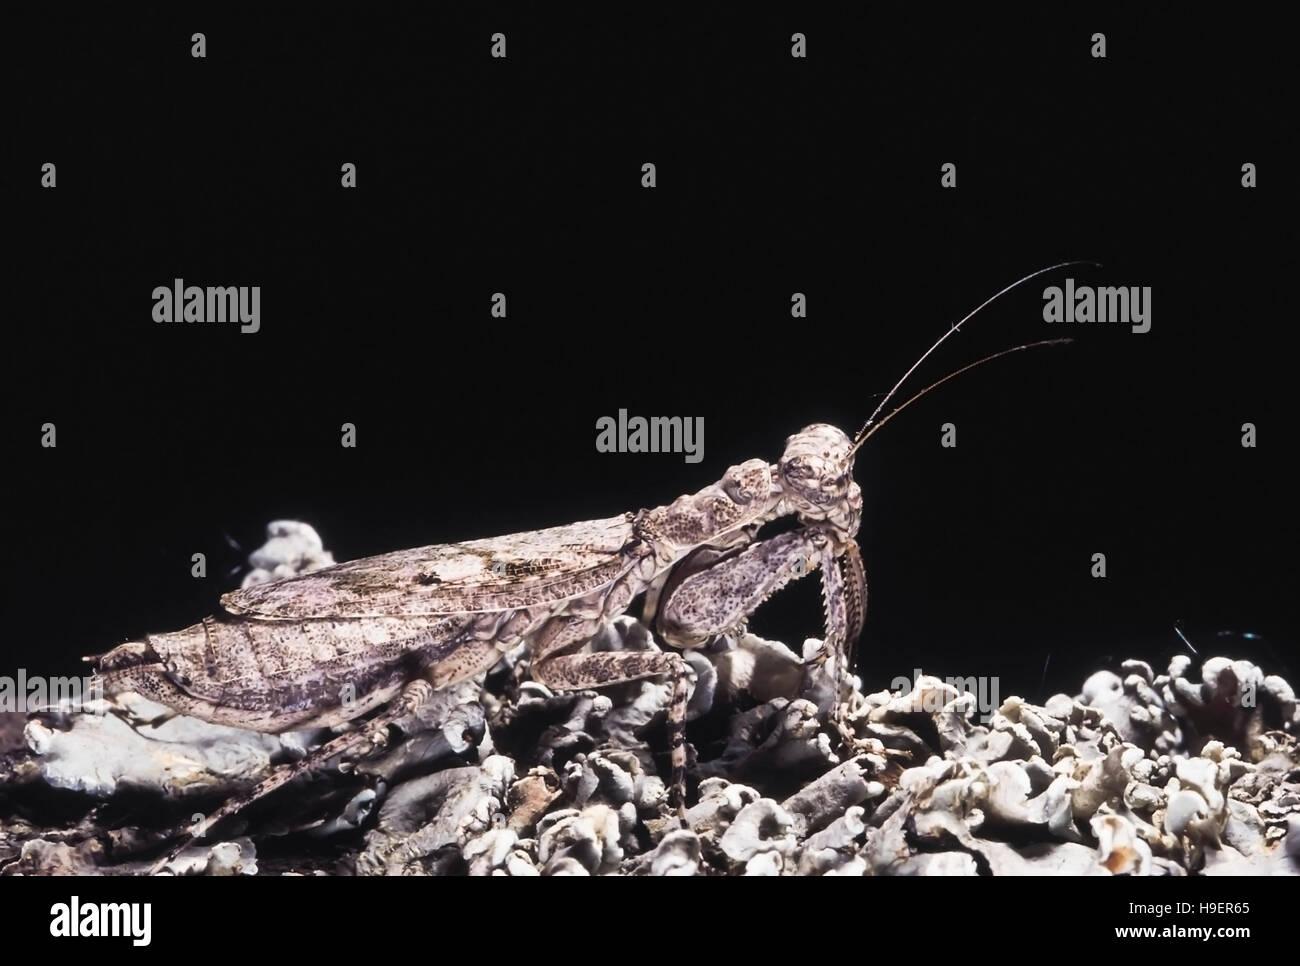 Humbertiella Indica. Selten. Praying Mantis perfekt getarnt auf Flechten. Maharashtra, Indien. Stockbild